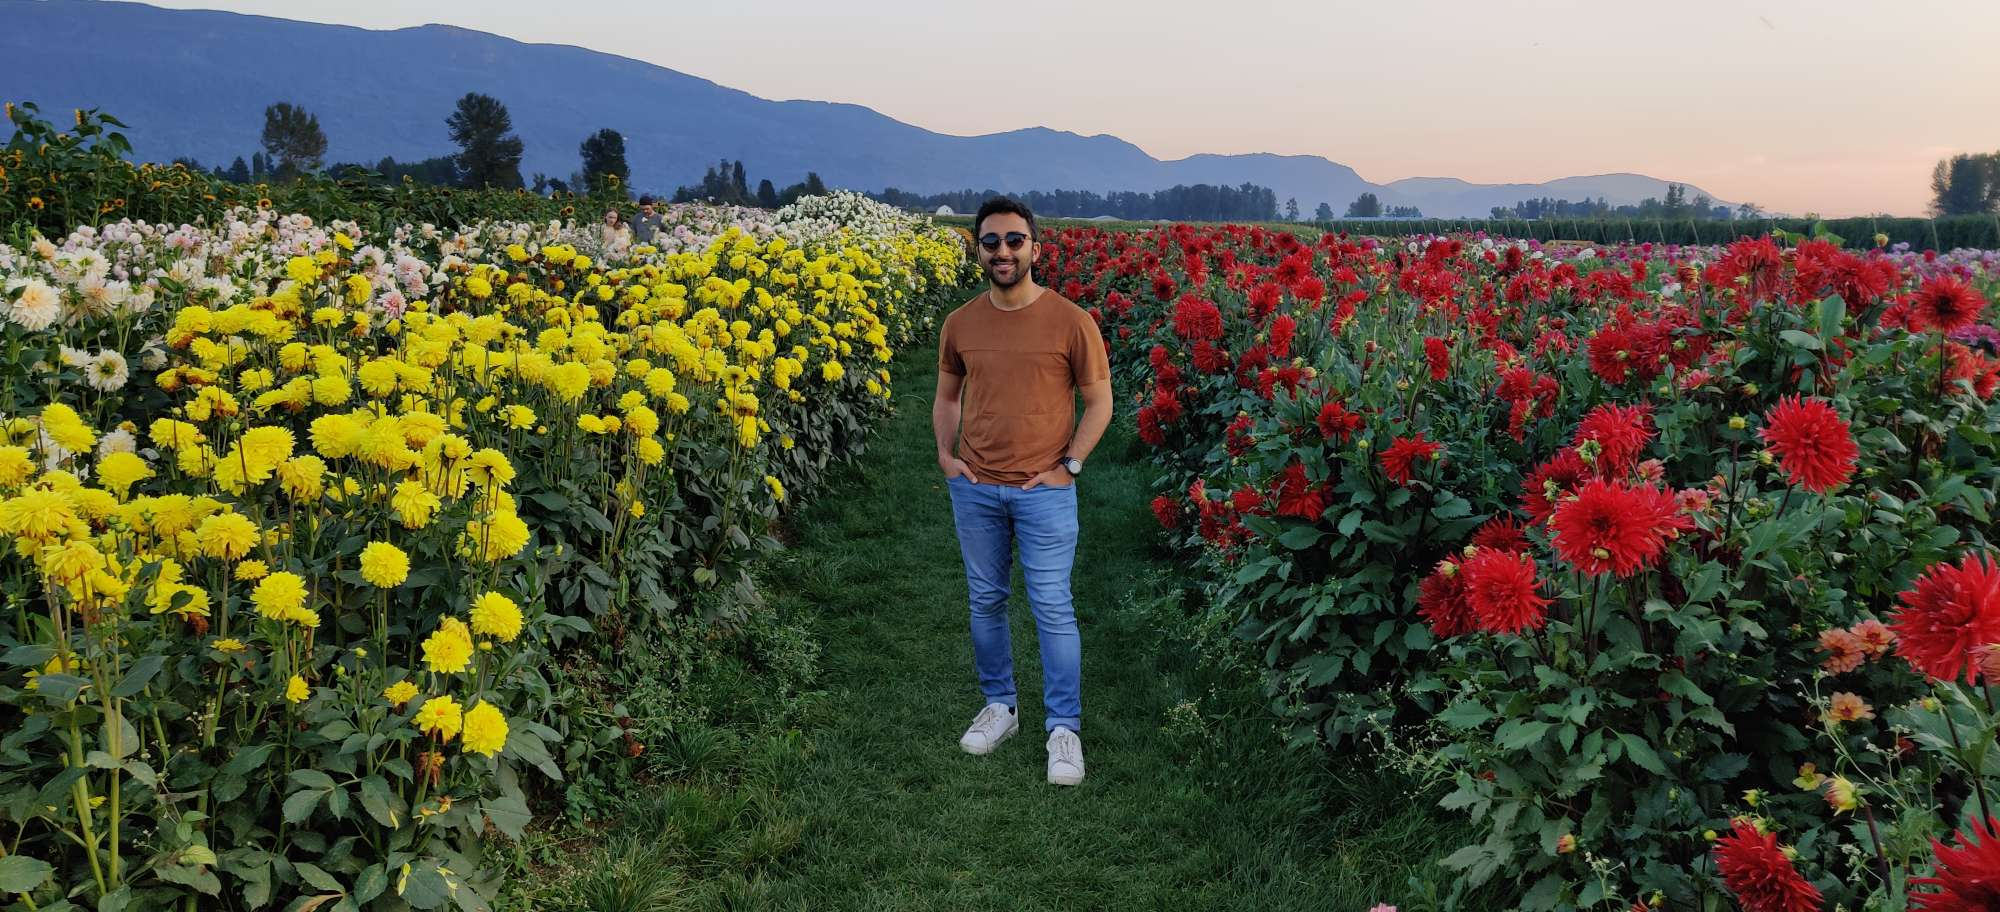 Ahmed Hossam's profile image